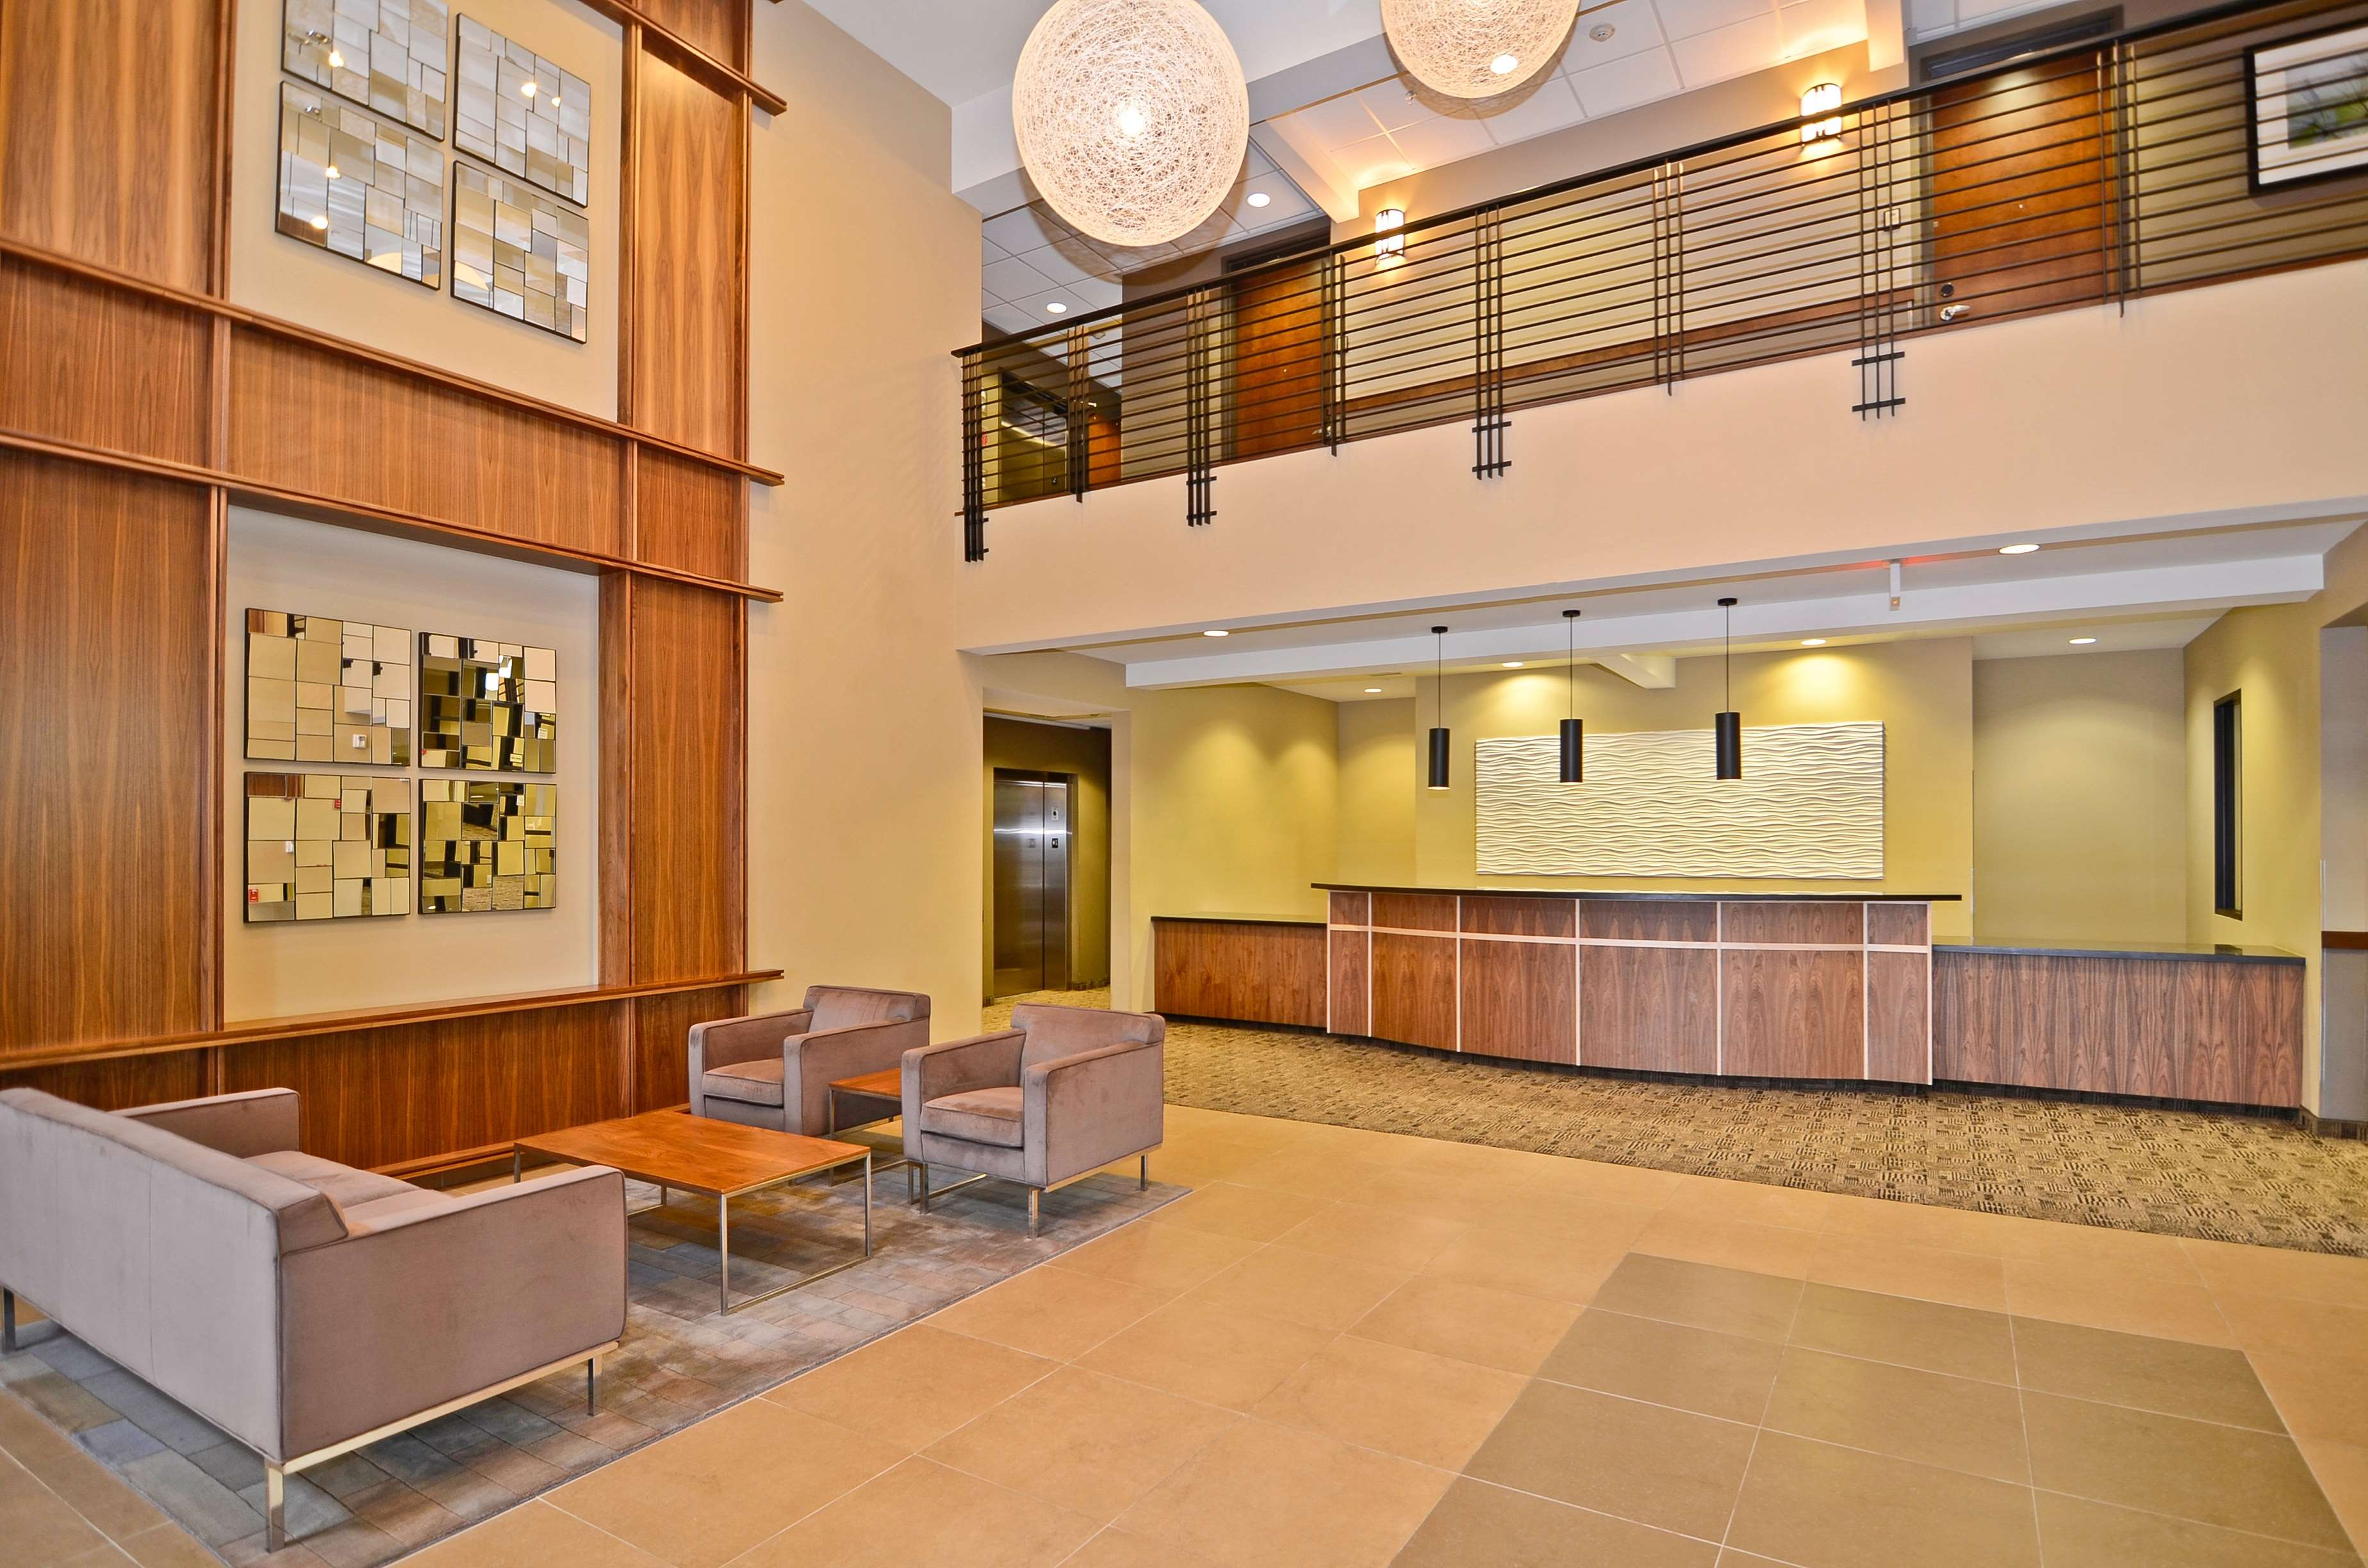 Best Western Plus Lacey Inn & Suites image 13